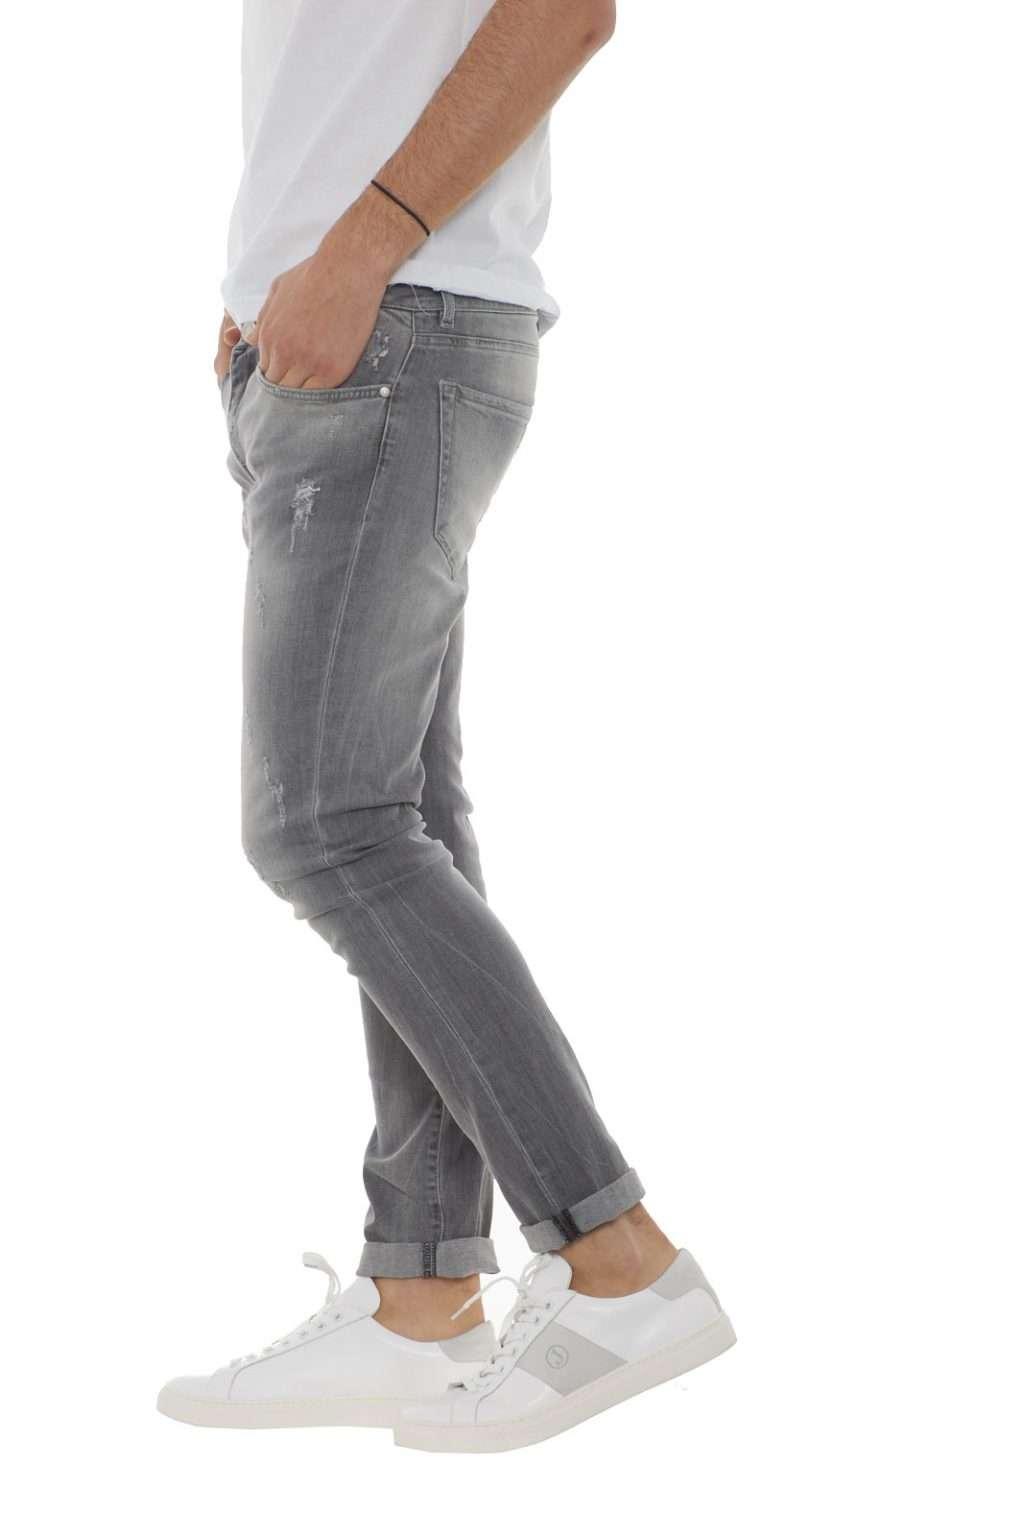 https://www.parmax.com/media/catalog/product/a/i/PE-outlet_parmax-denim-uomo-Clink-Jeans-London-MARTIN-B.jpg